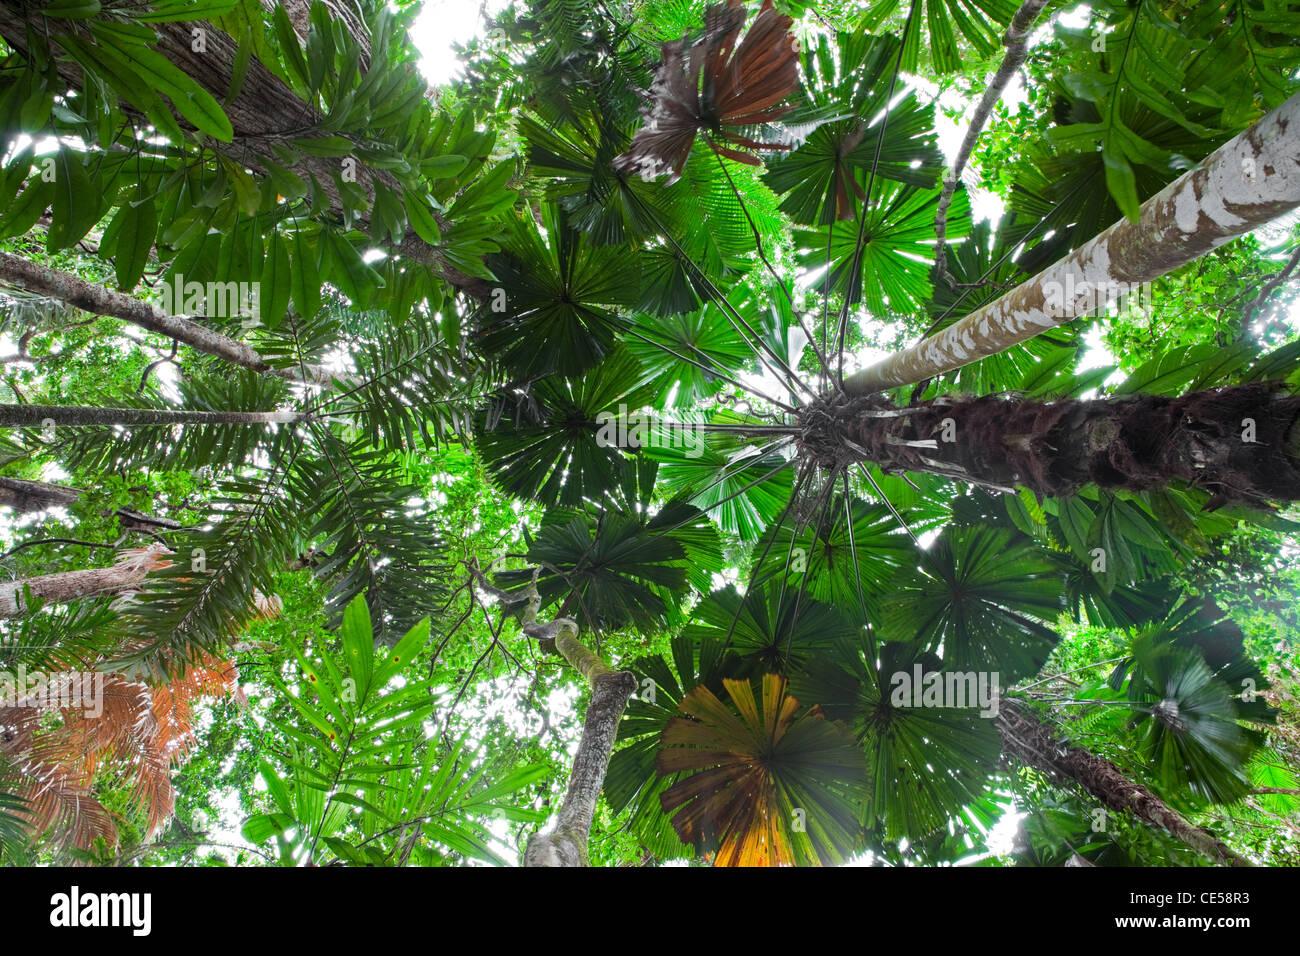 daintree rain forest rainforest stock photos u0026 daintree rain